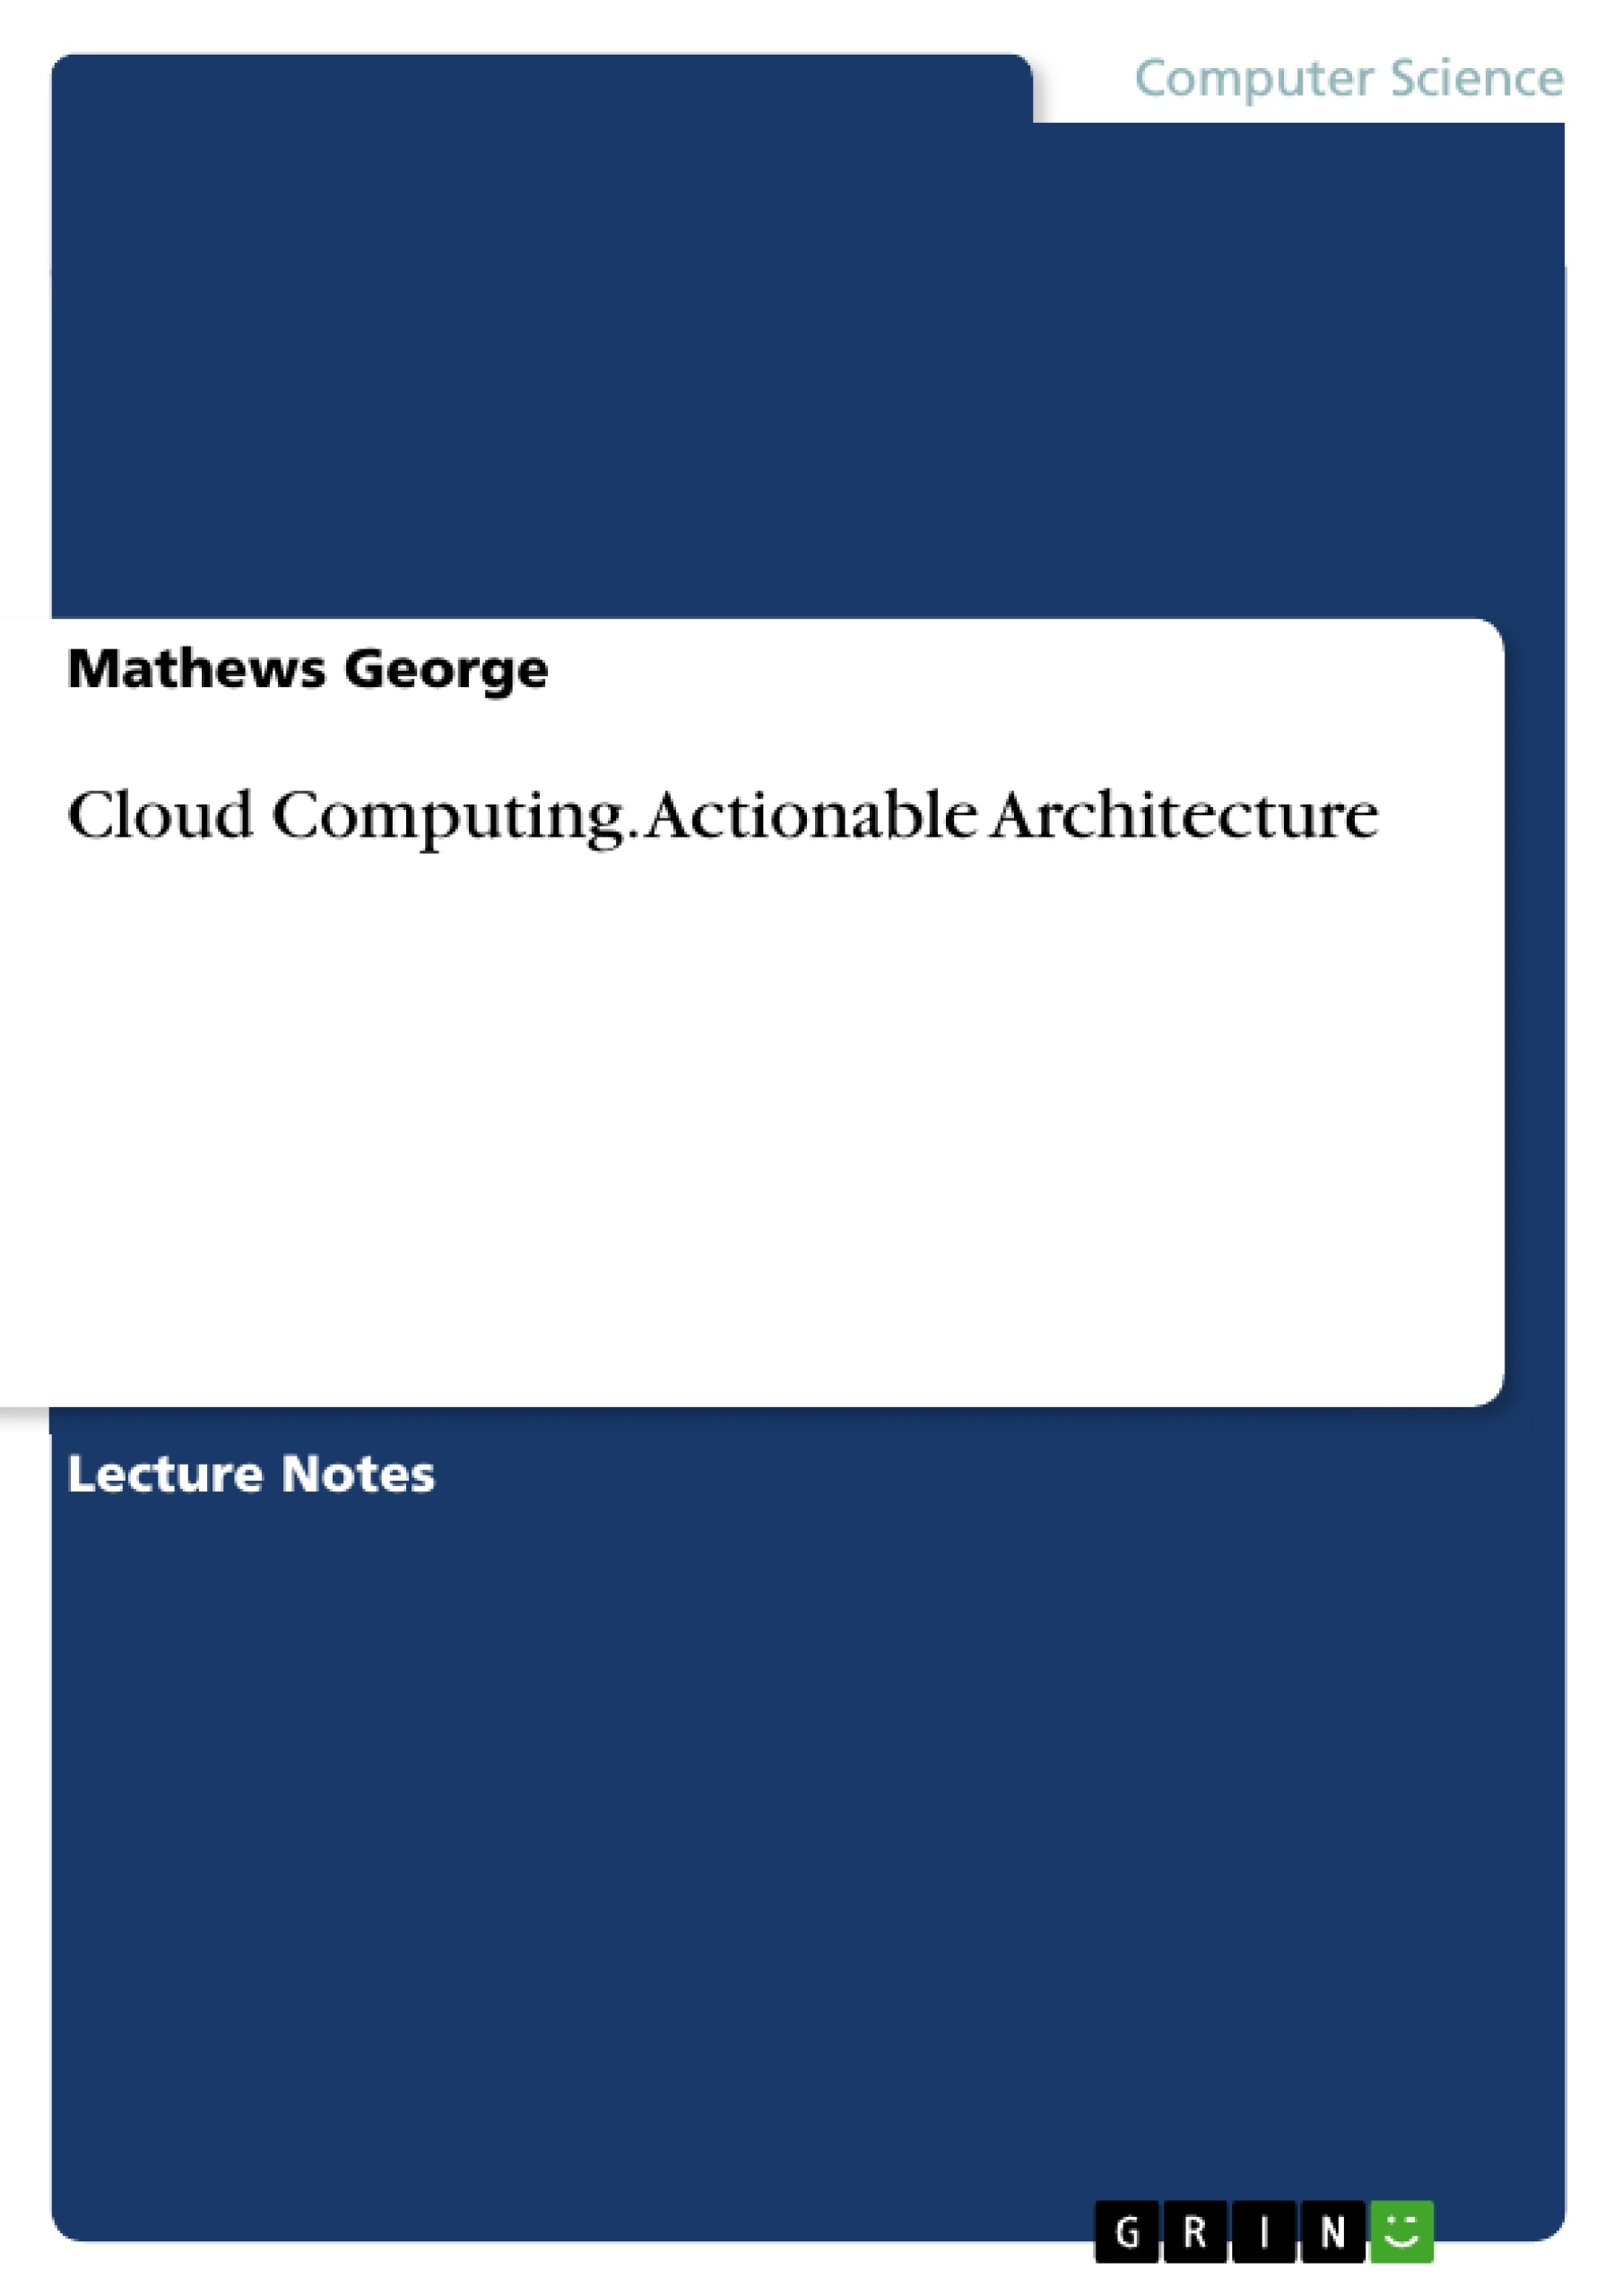 Title: Cloud Computing. Actionable Architecture